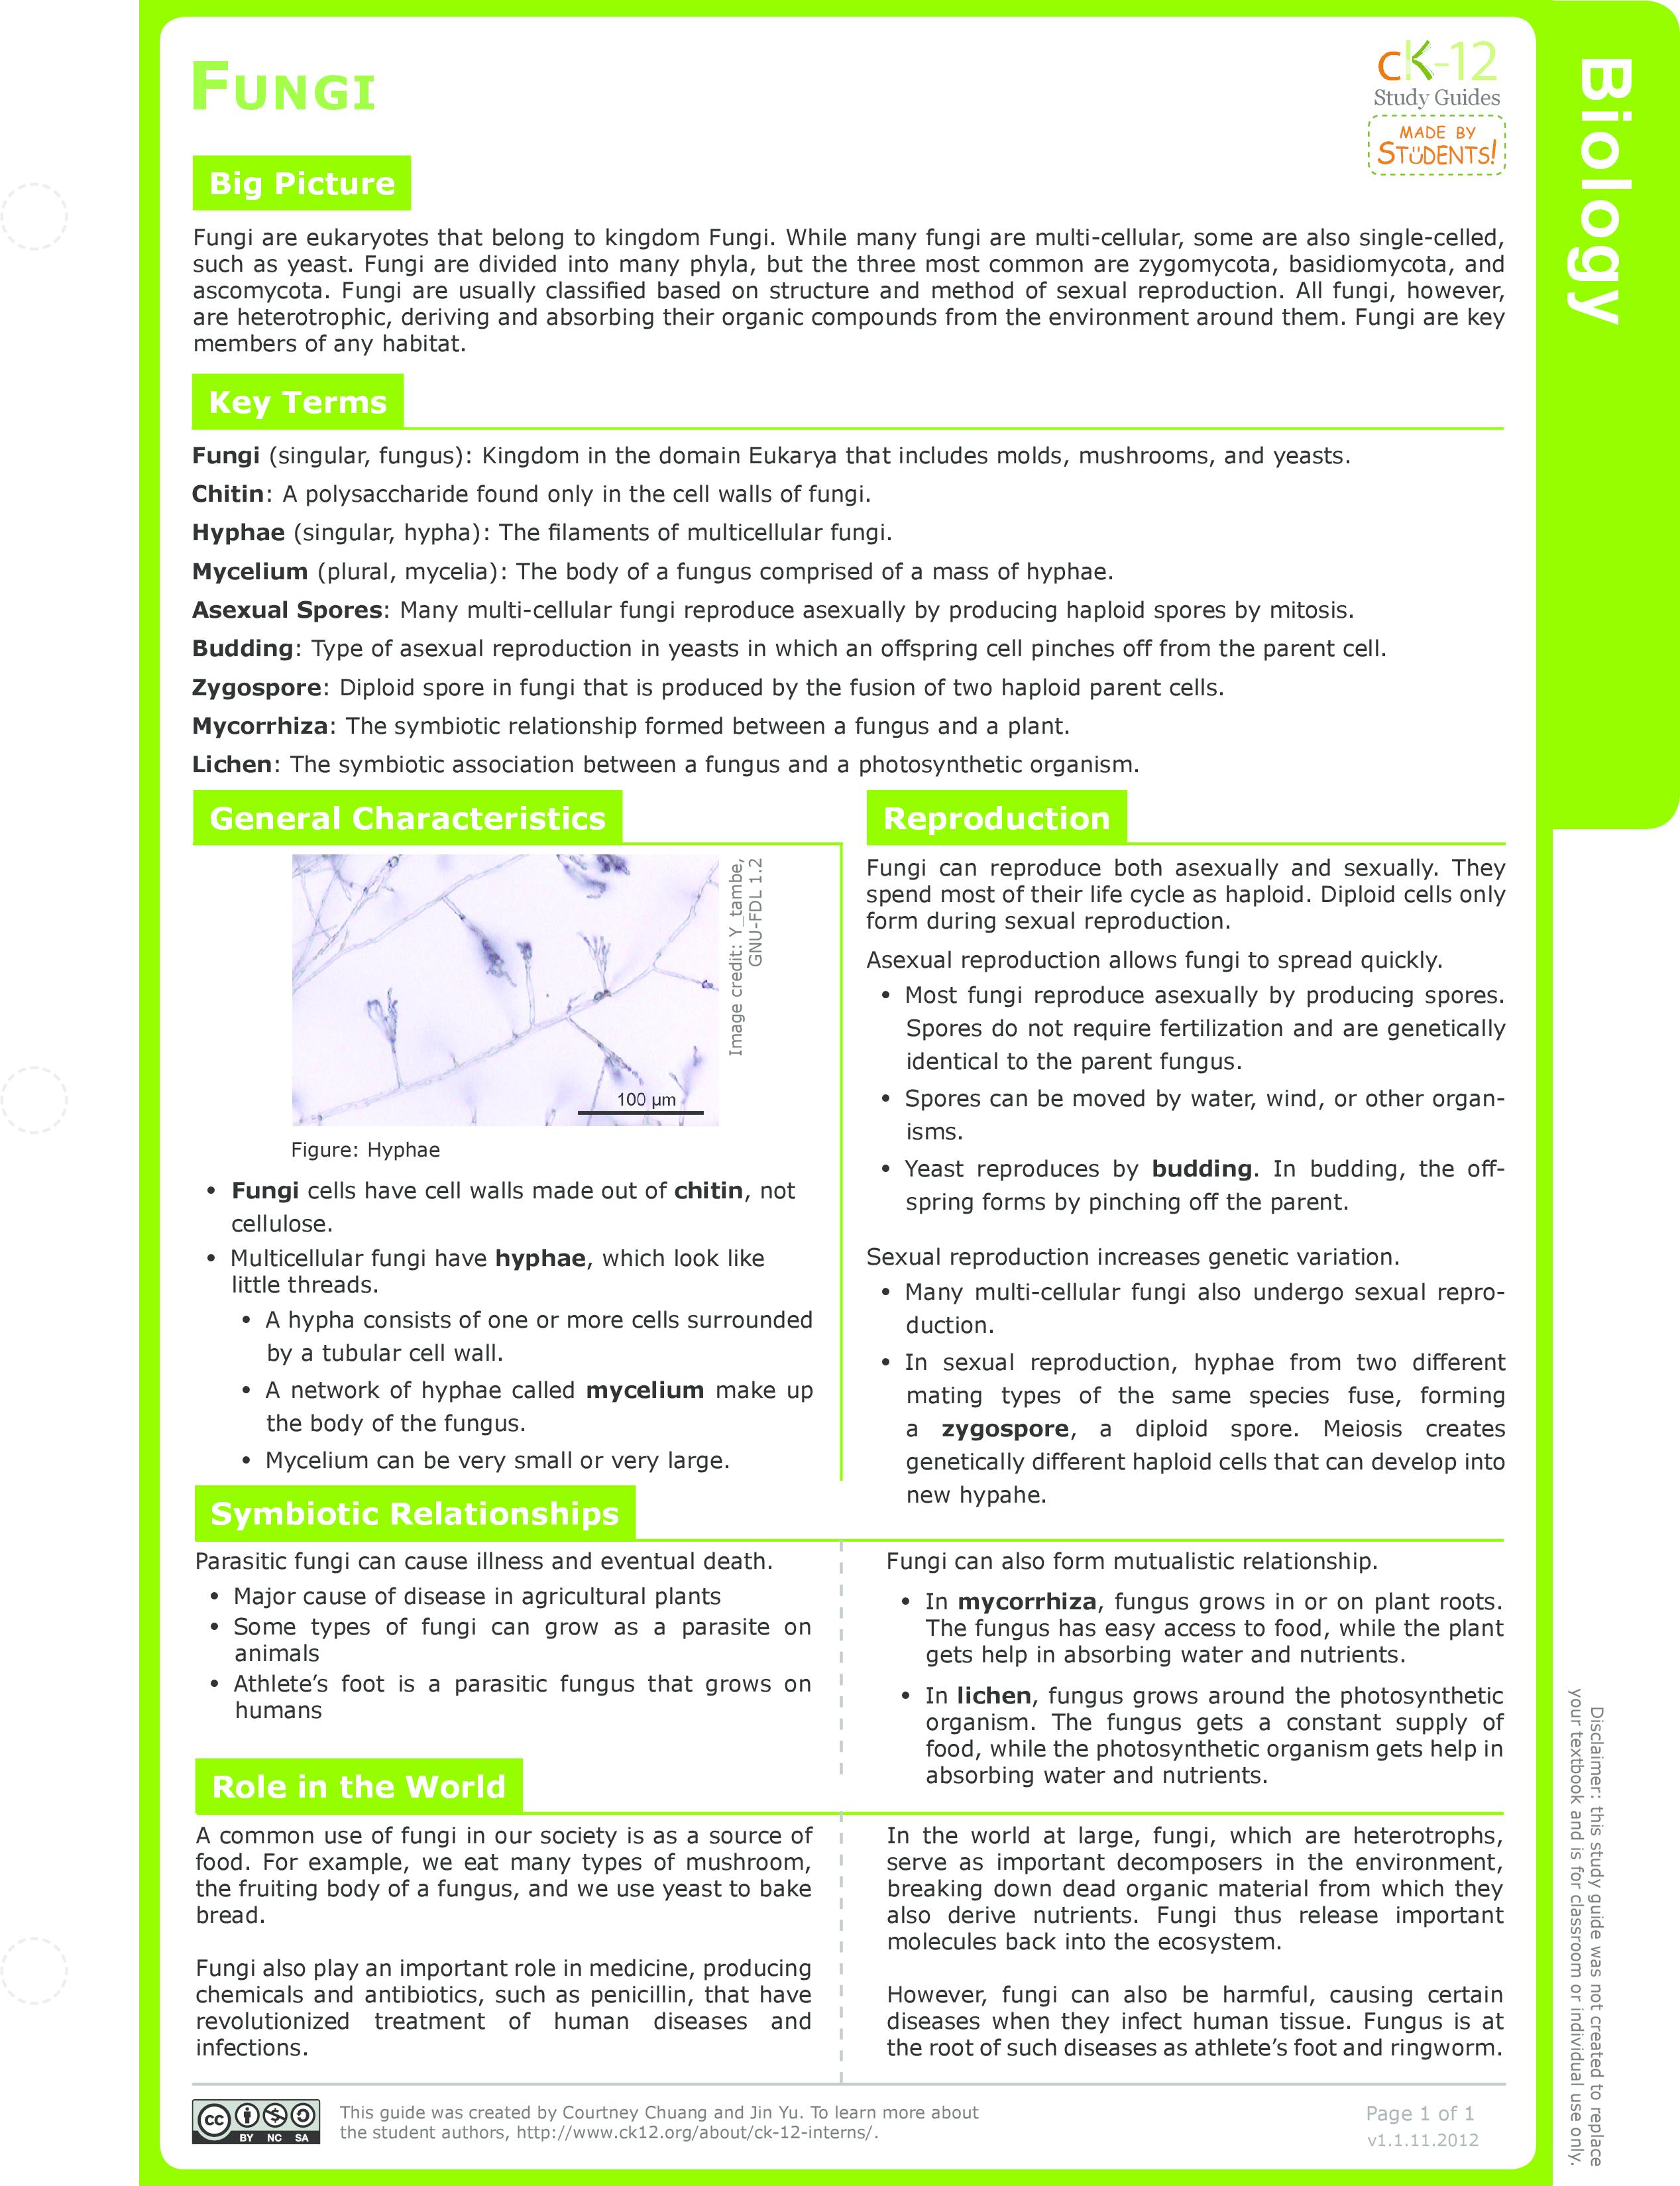 worksheet Fungi Worksheet fungi structure ck 12 foundation study guide